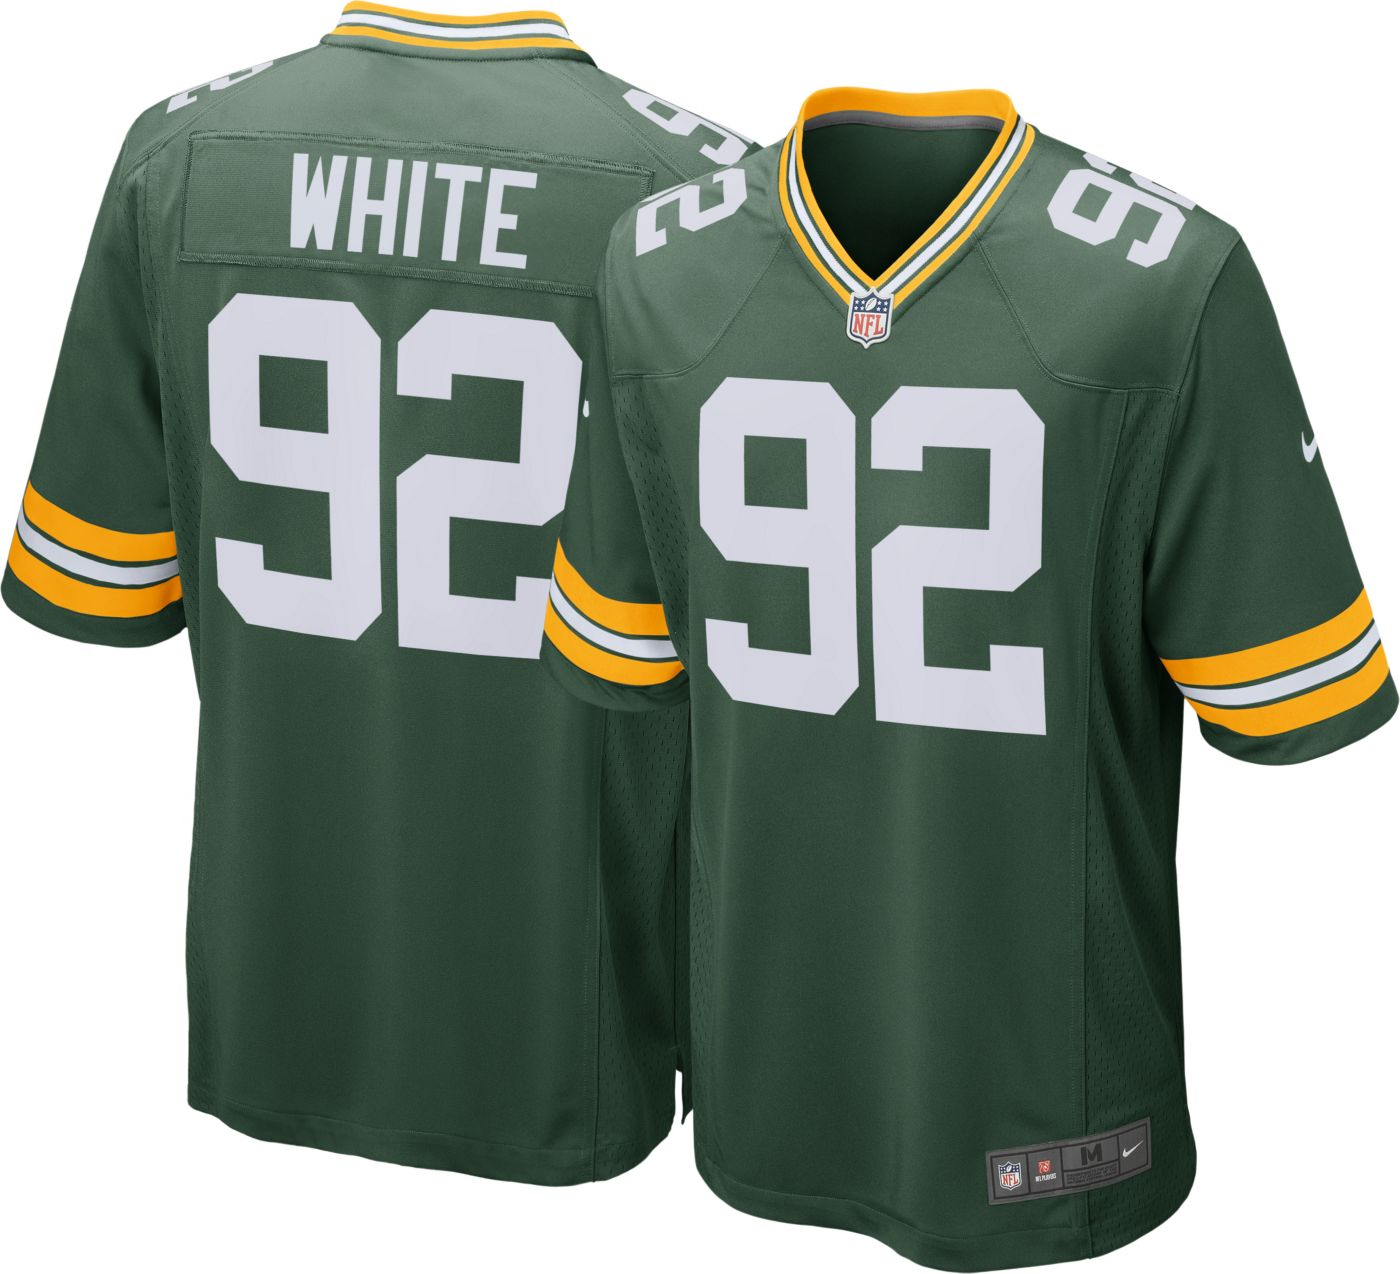 Nike Men's Home Game Jersey Green Bay Packers Reggie White #92